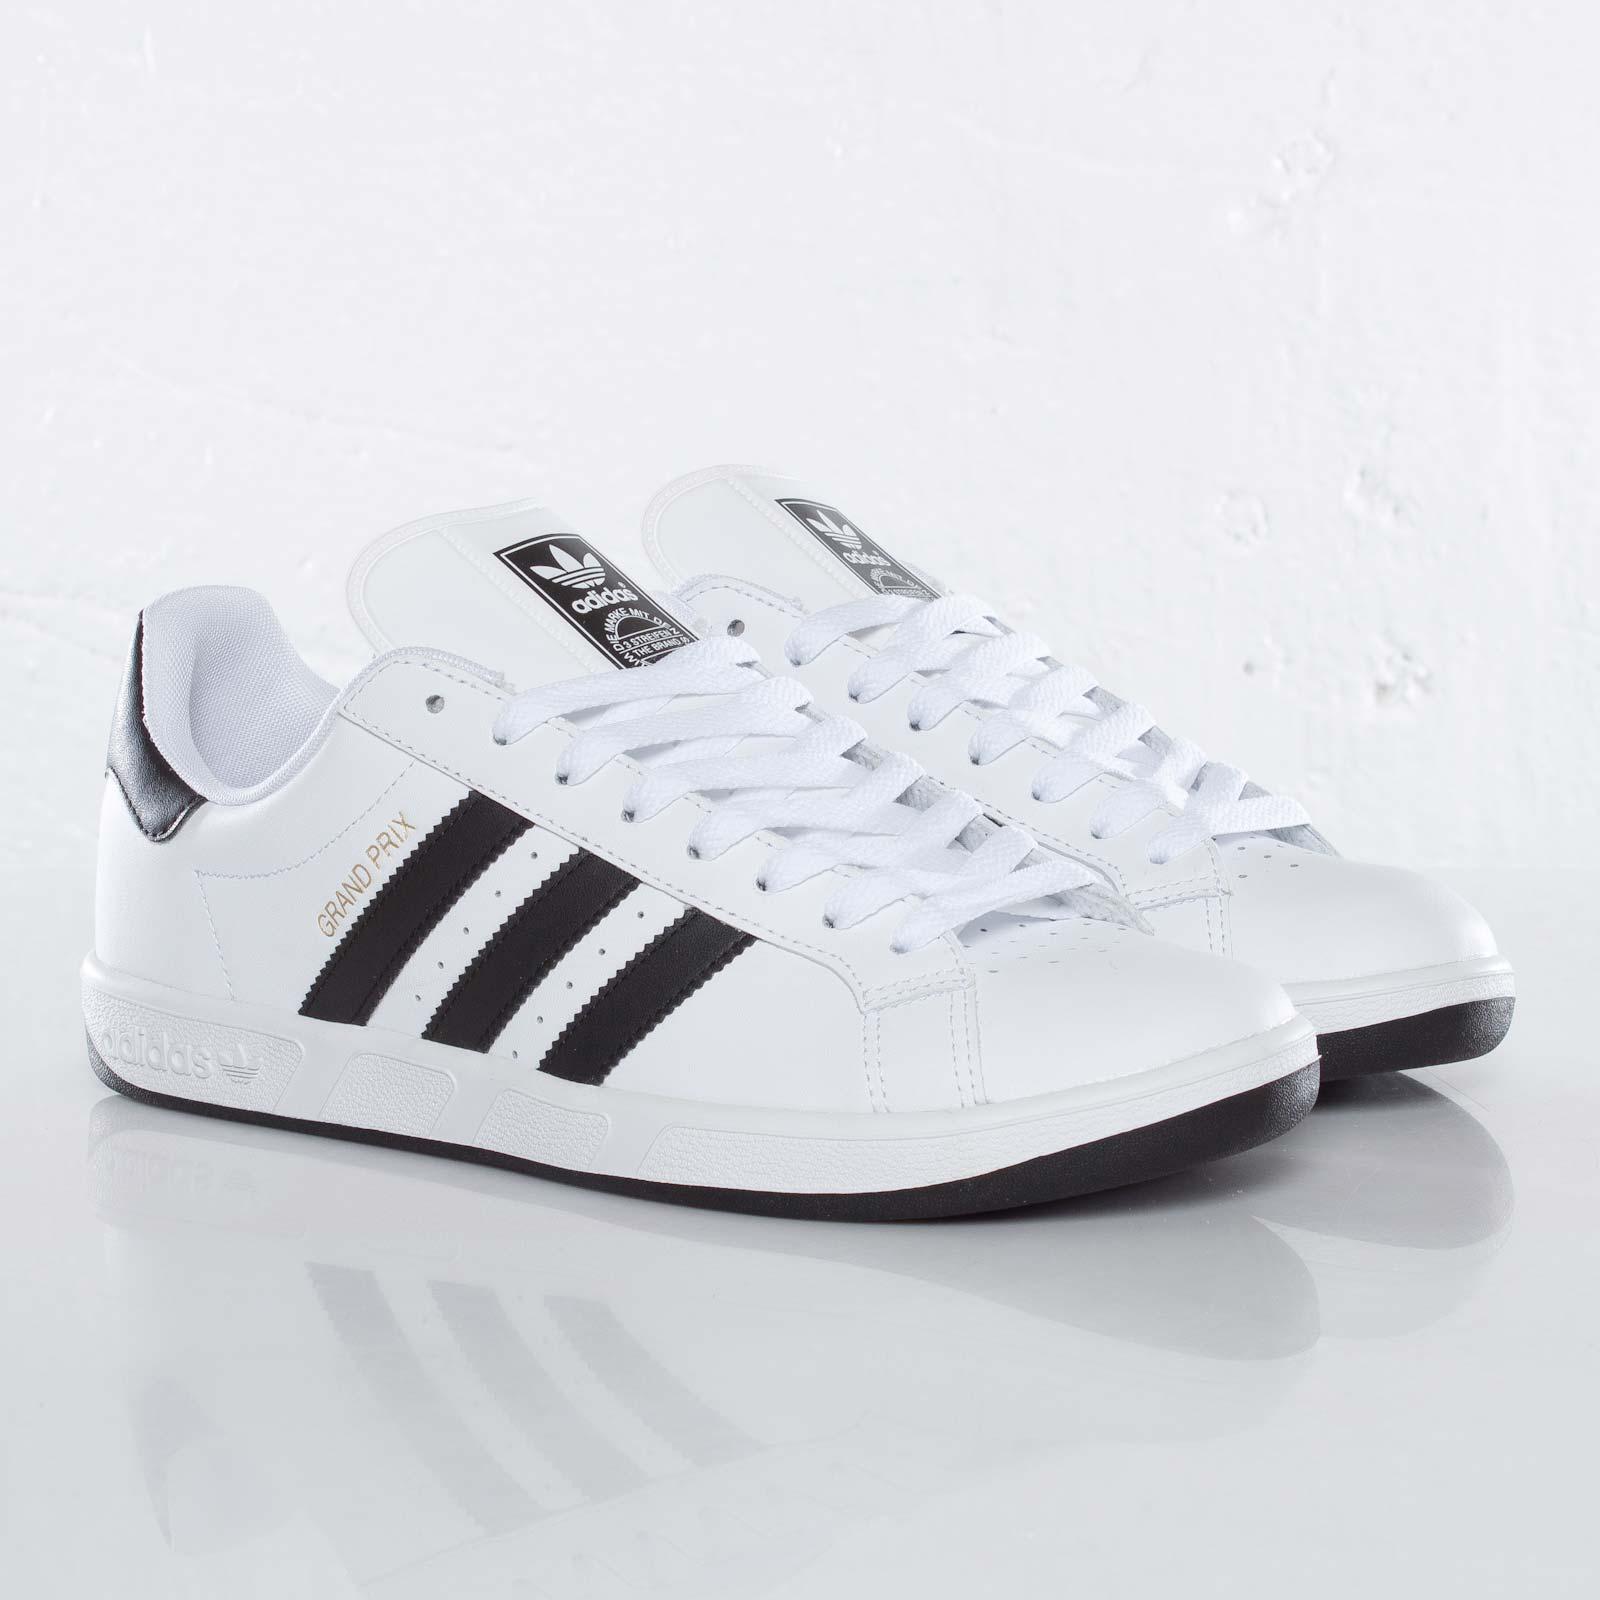 adidas Grand Prix - G59935 - SNS | sneakers & streetwear online ...